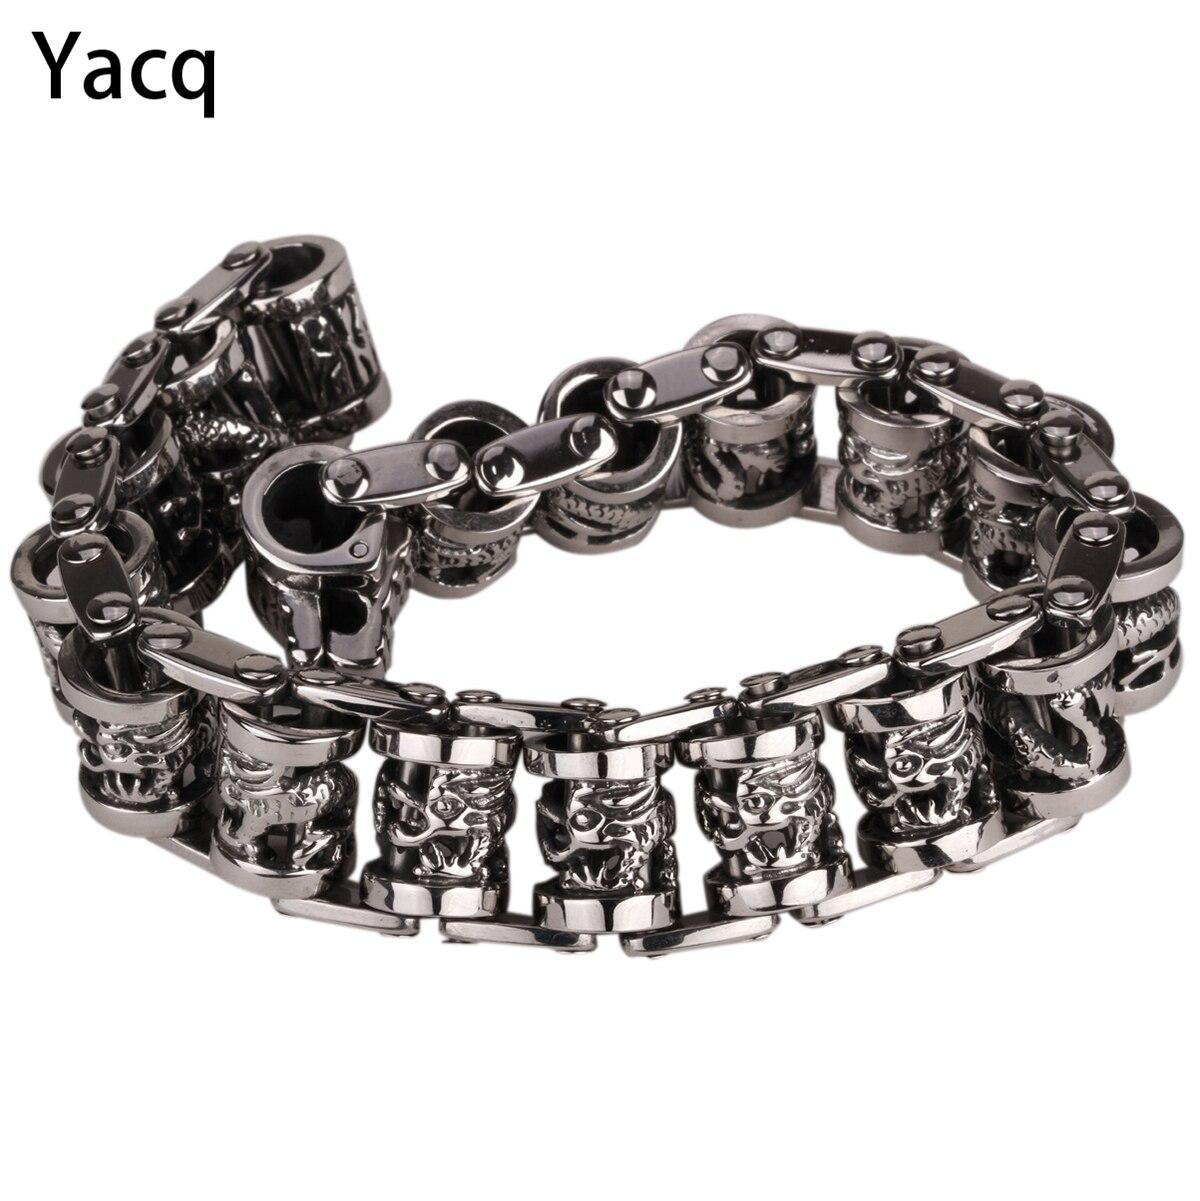 YACQ Men Dragon Stainless Steel Bracelet 316L Biker Heavy Punk Rock Jewelry Gift for Him ...